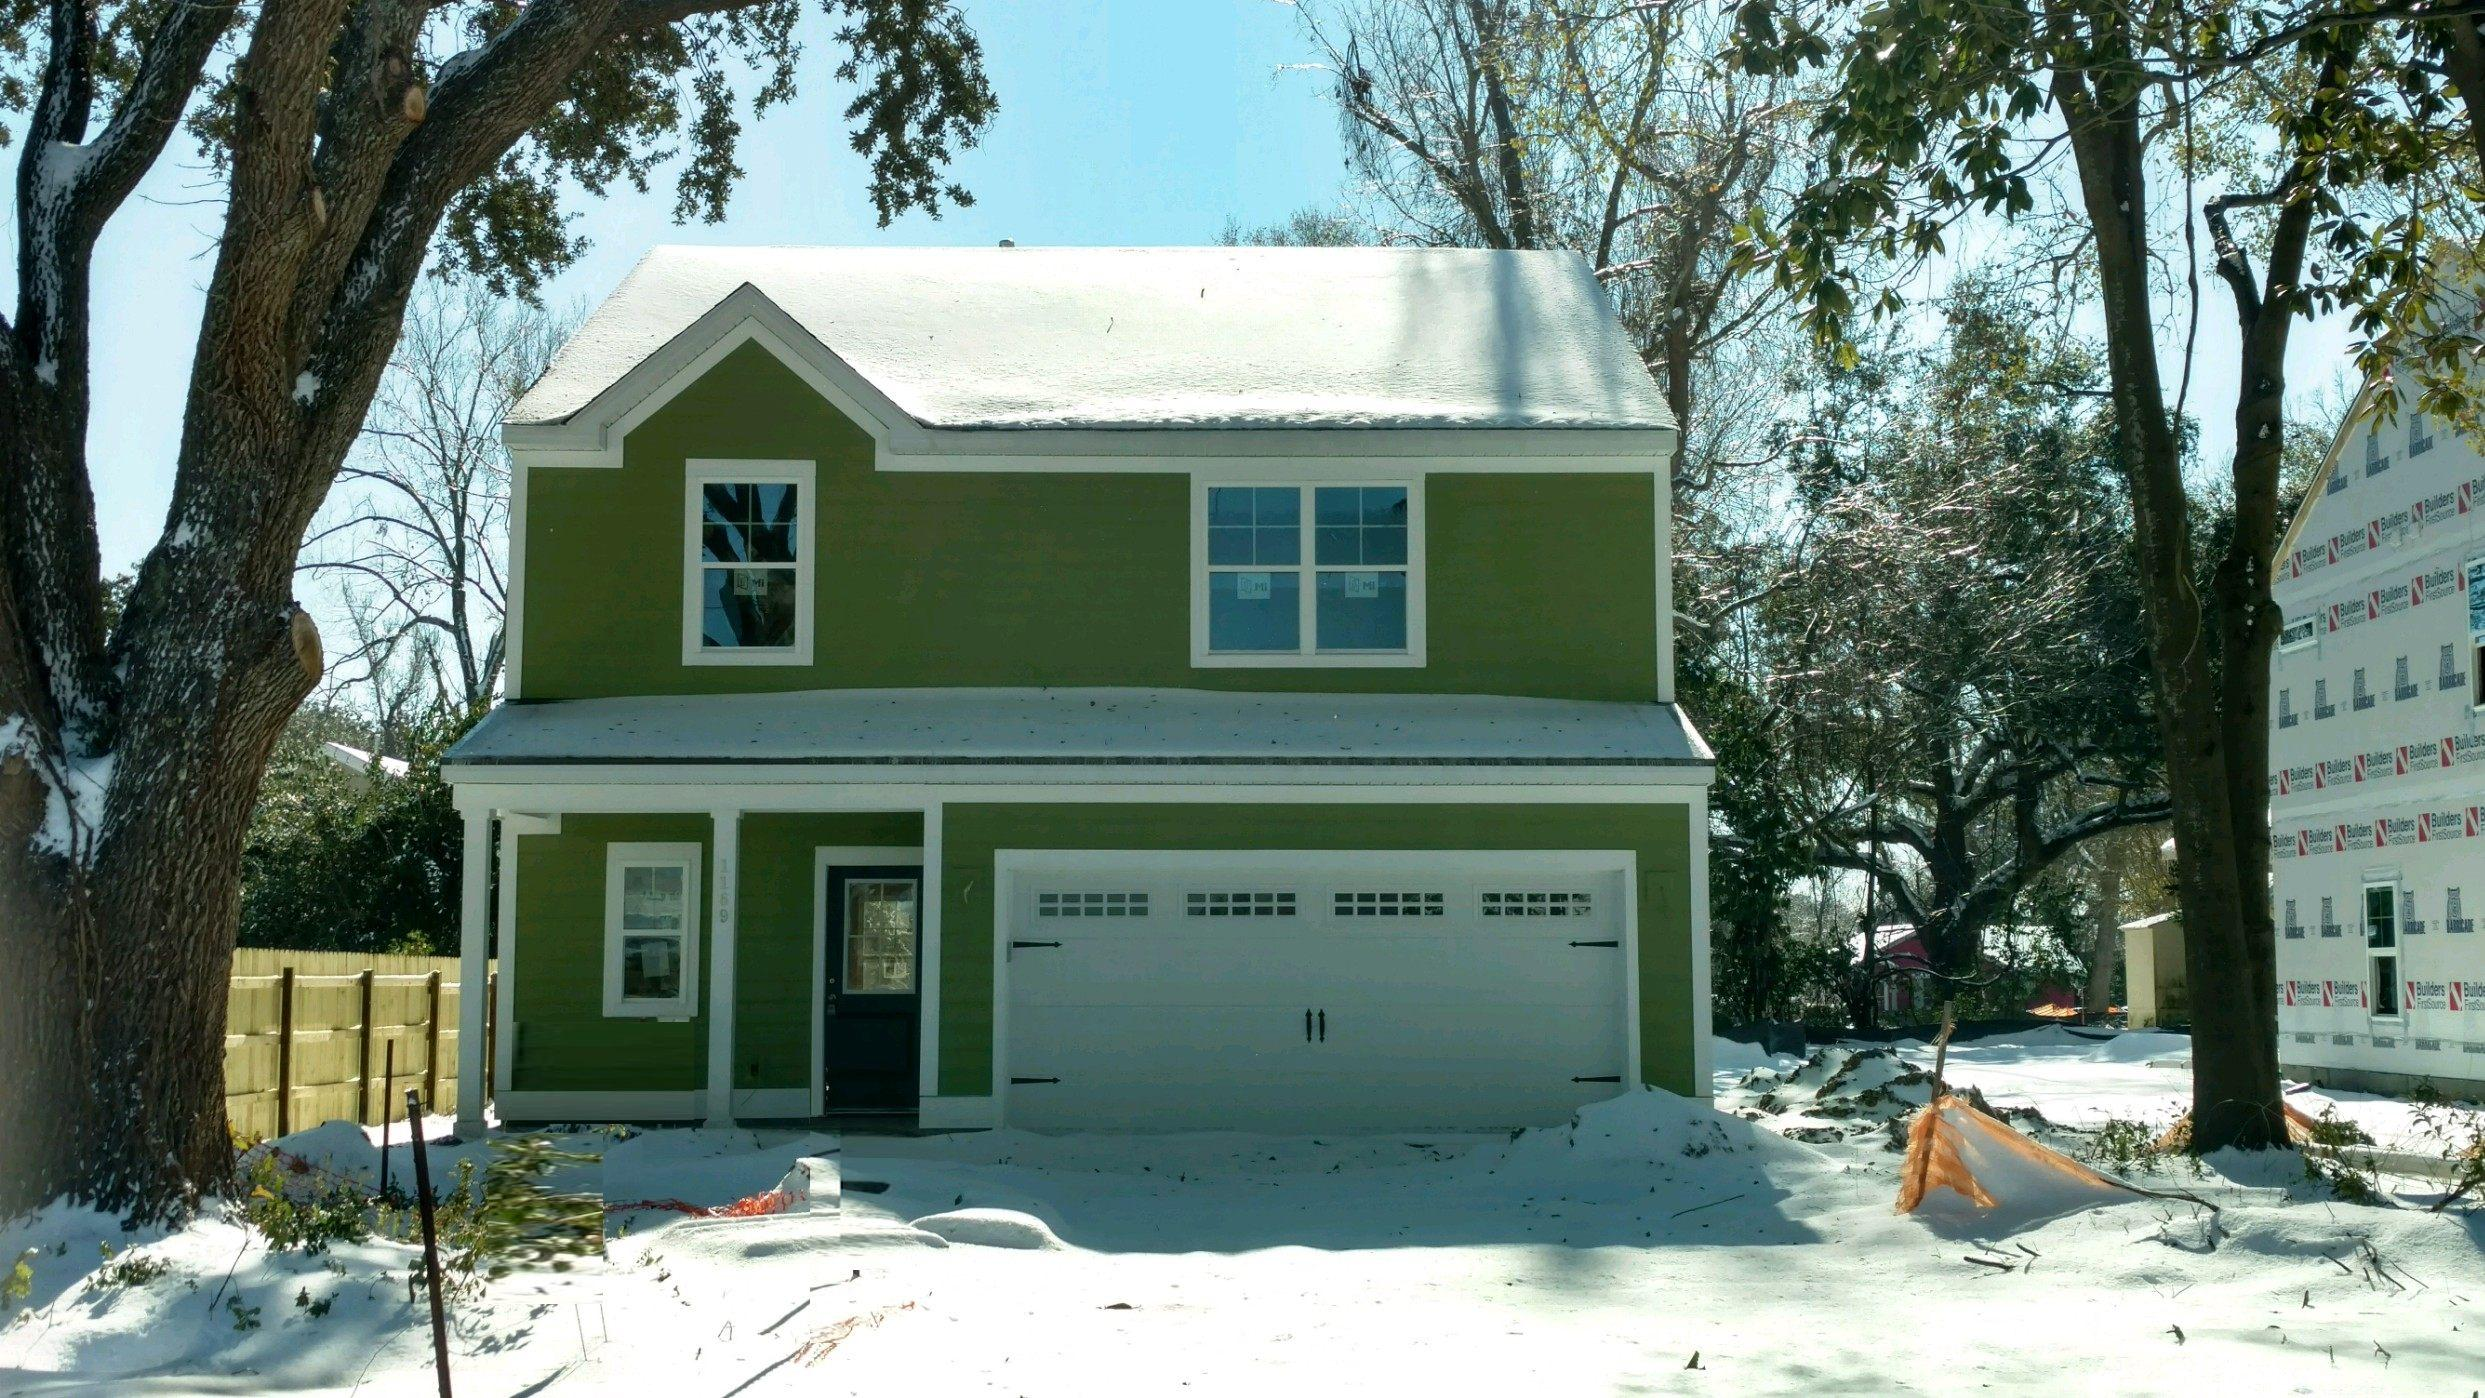 Photo of 1169 Sumner Ave, North Charleston, SC 29406